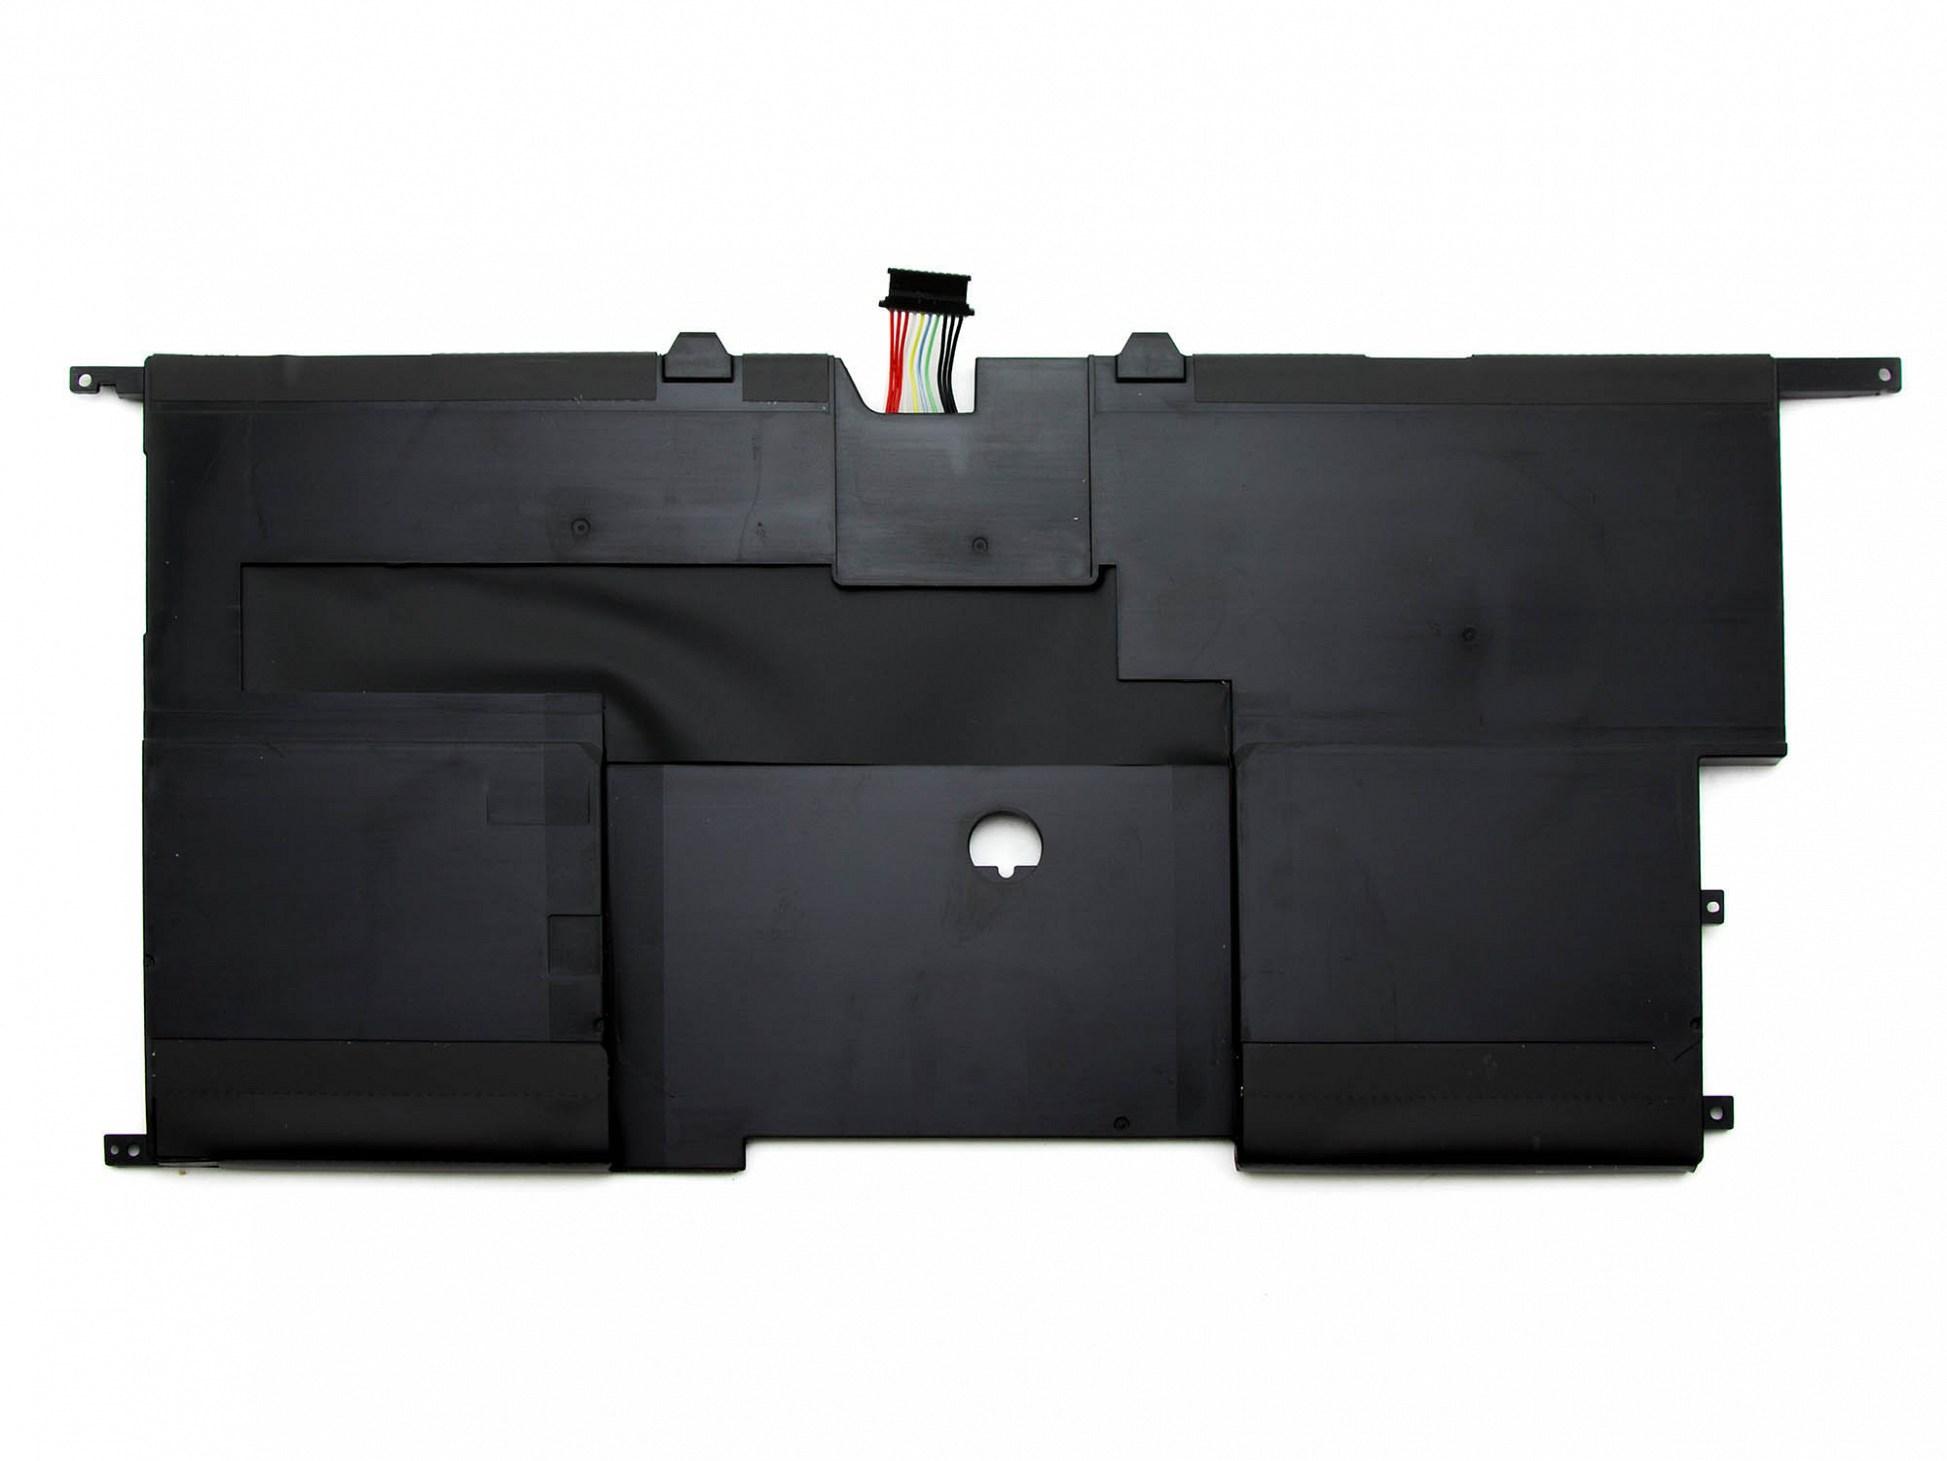 akku 45wh original f r lenovo thinkpad x1 carbon 20a7. Black Bedroom Furniture Sets. Home Design Ideas